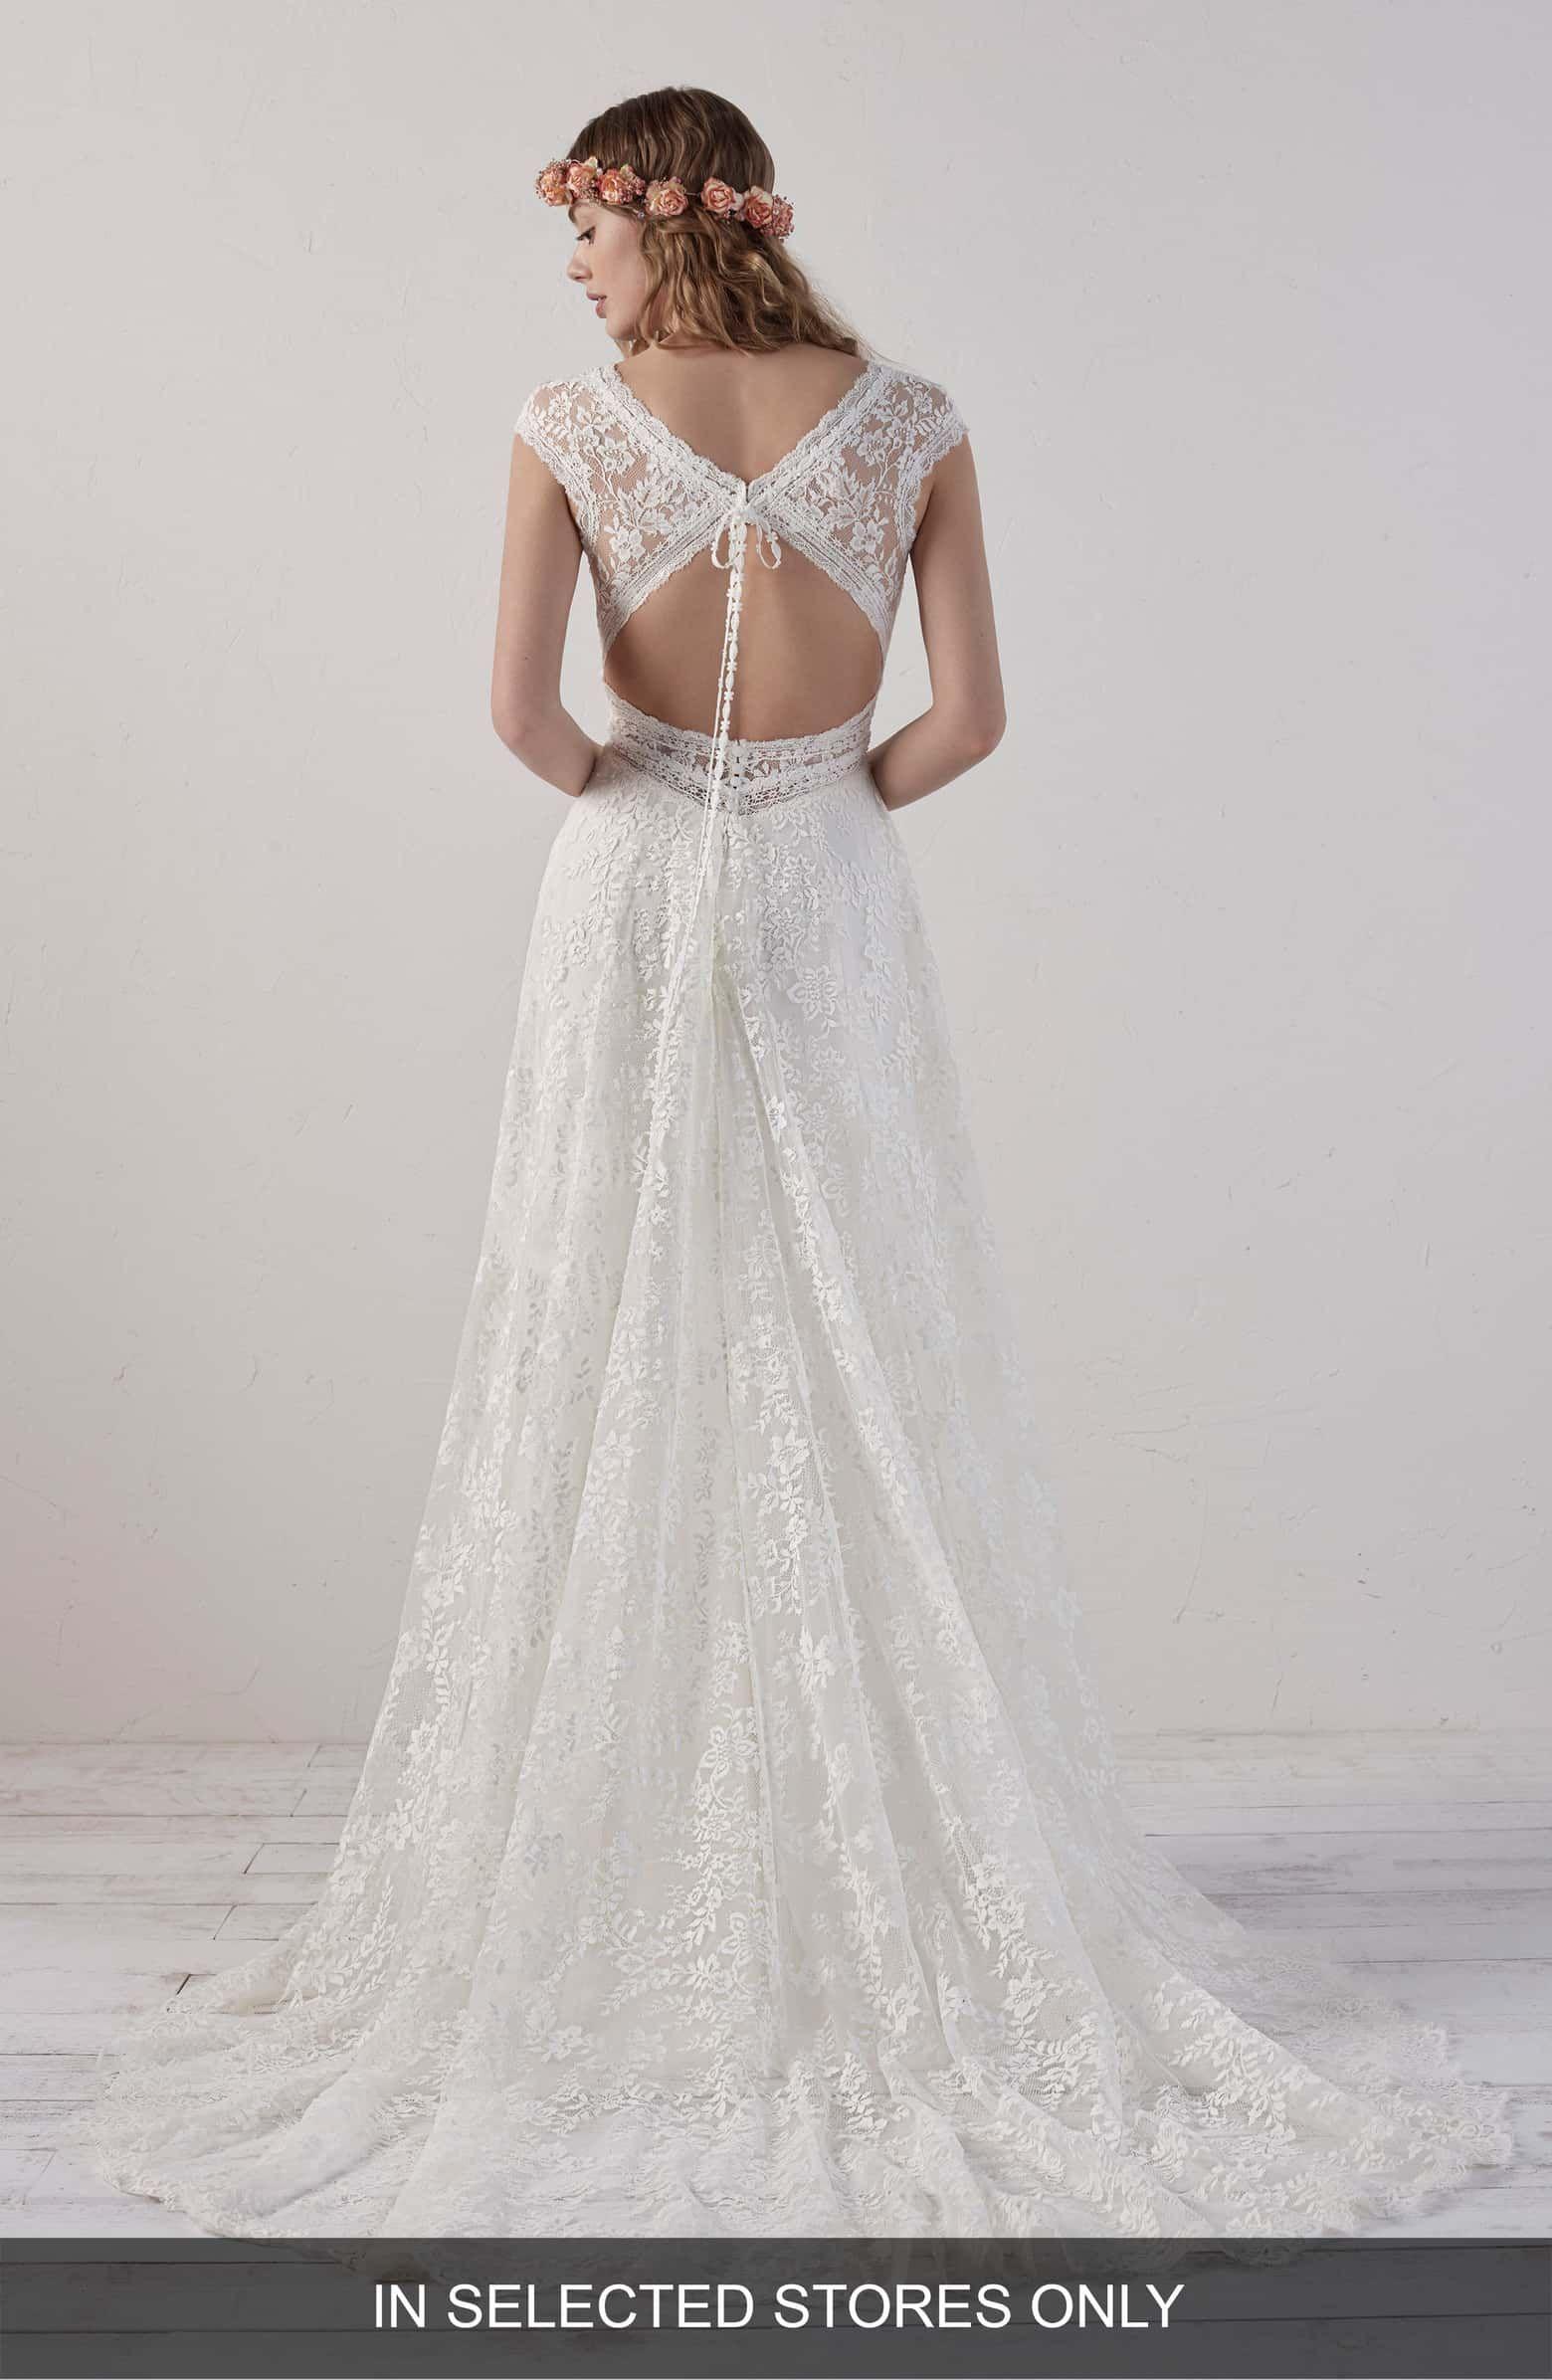 8469d21841d Ederne Boho Keyhole Back Lace Gown